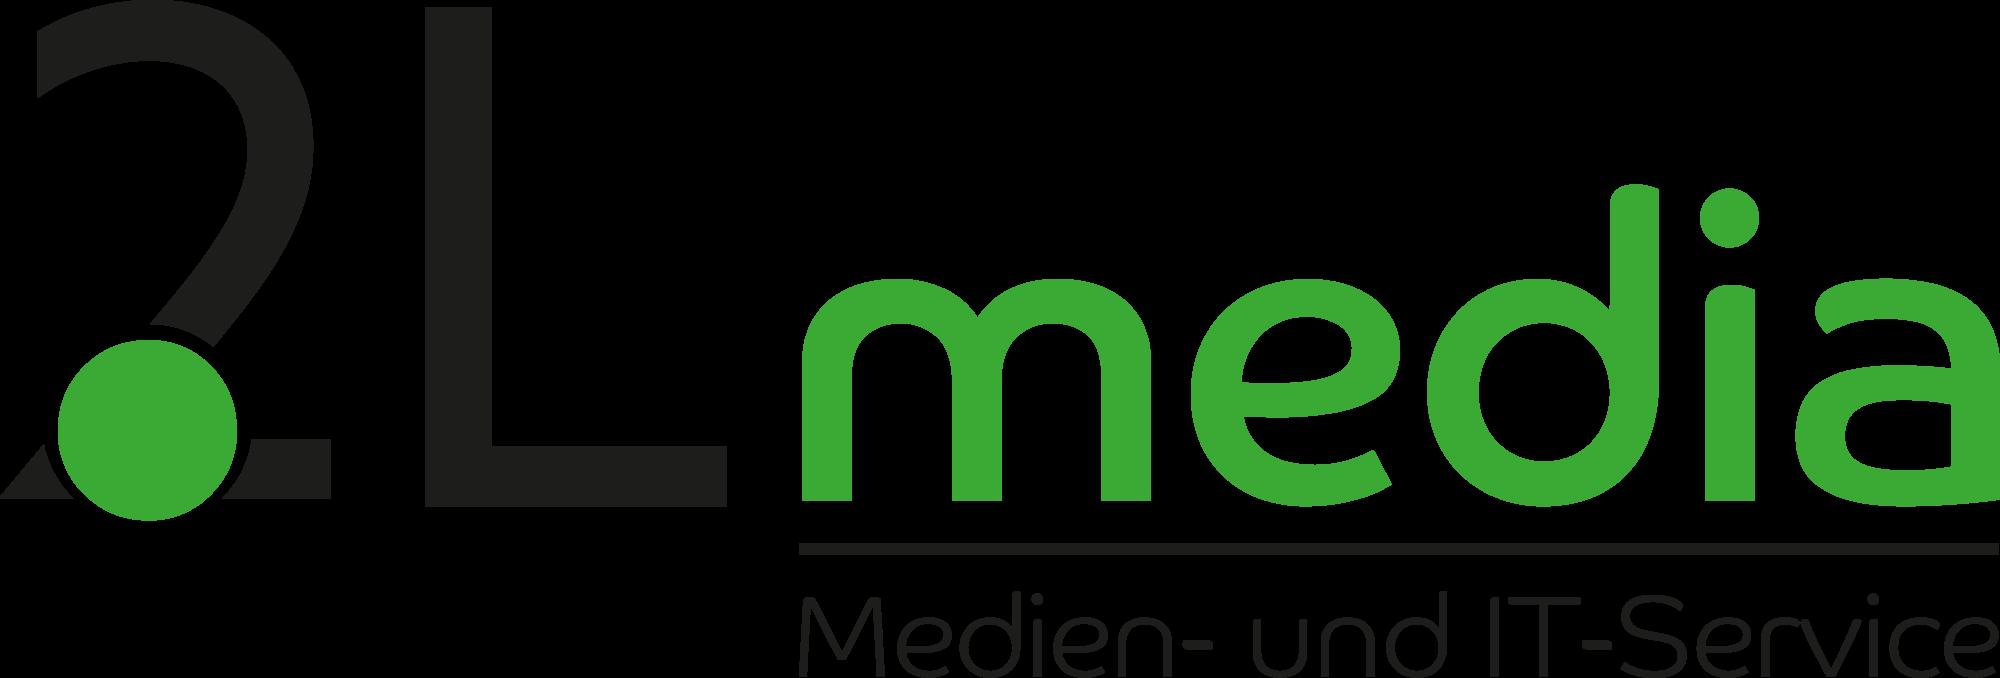 2L.media – Medien- und IT-Service